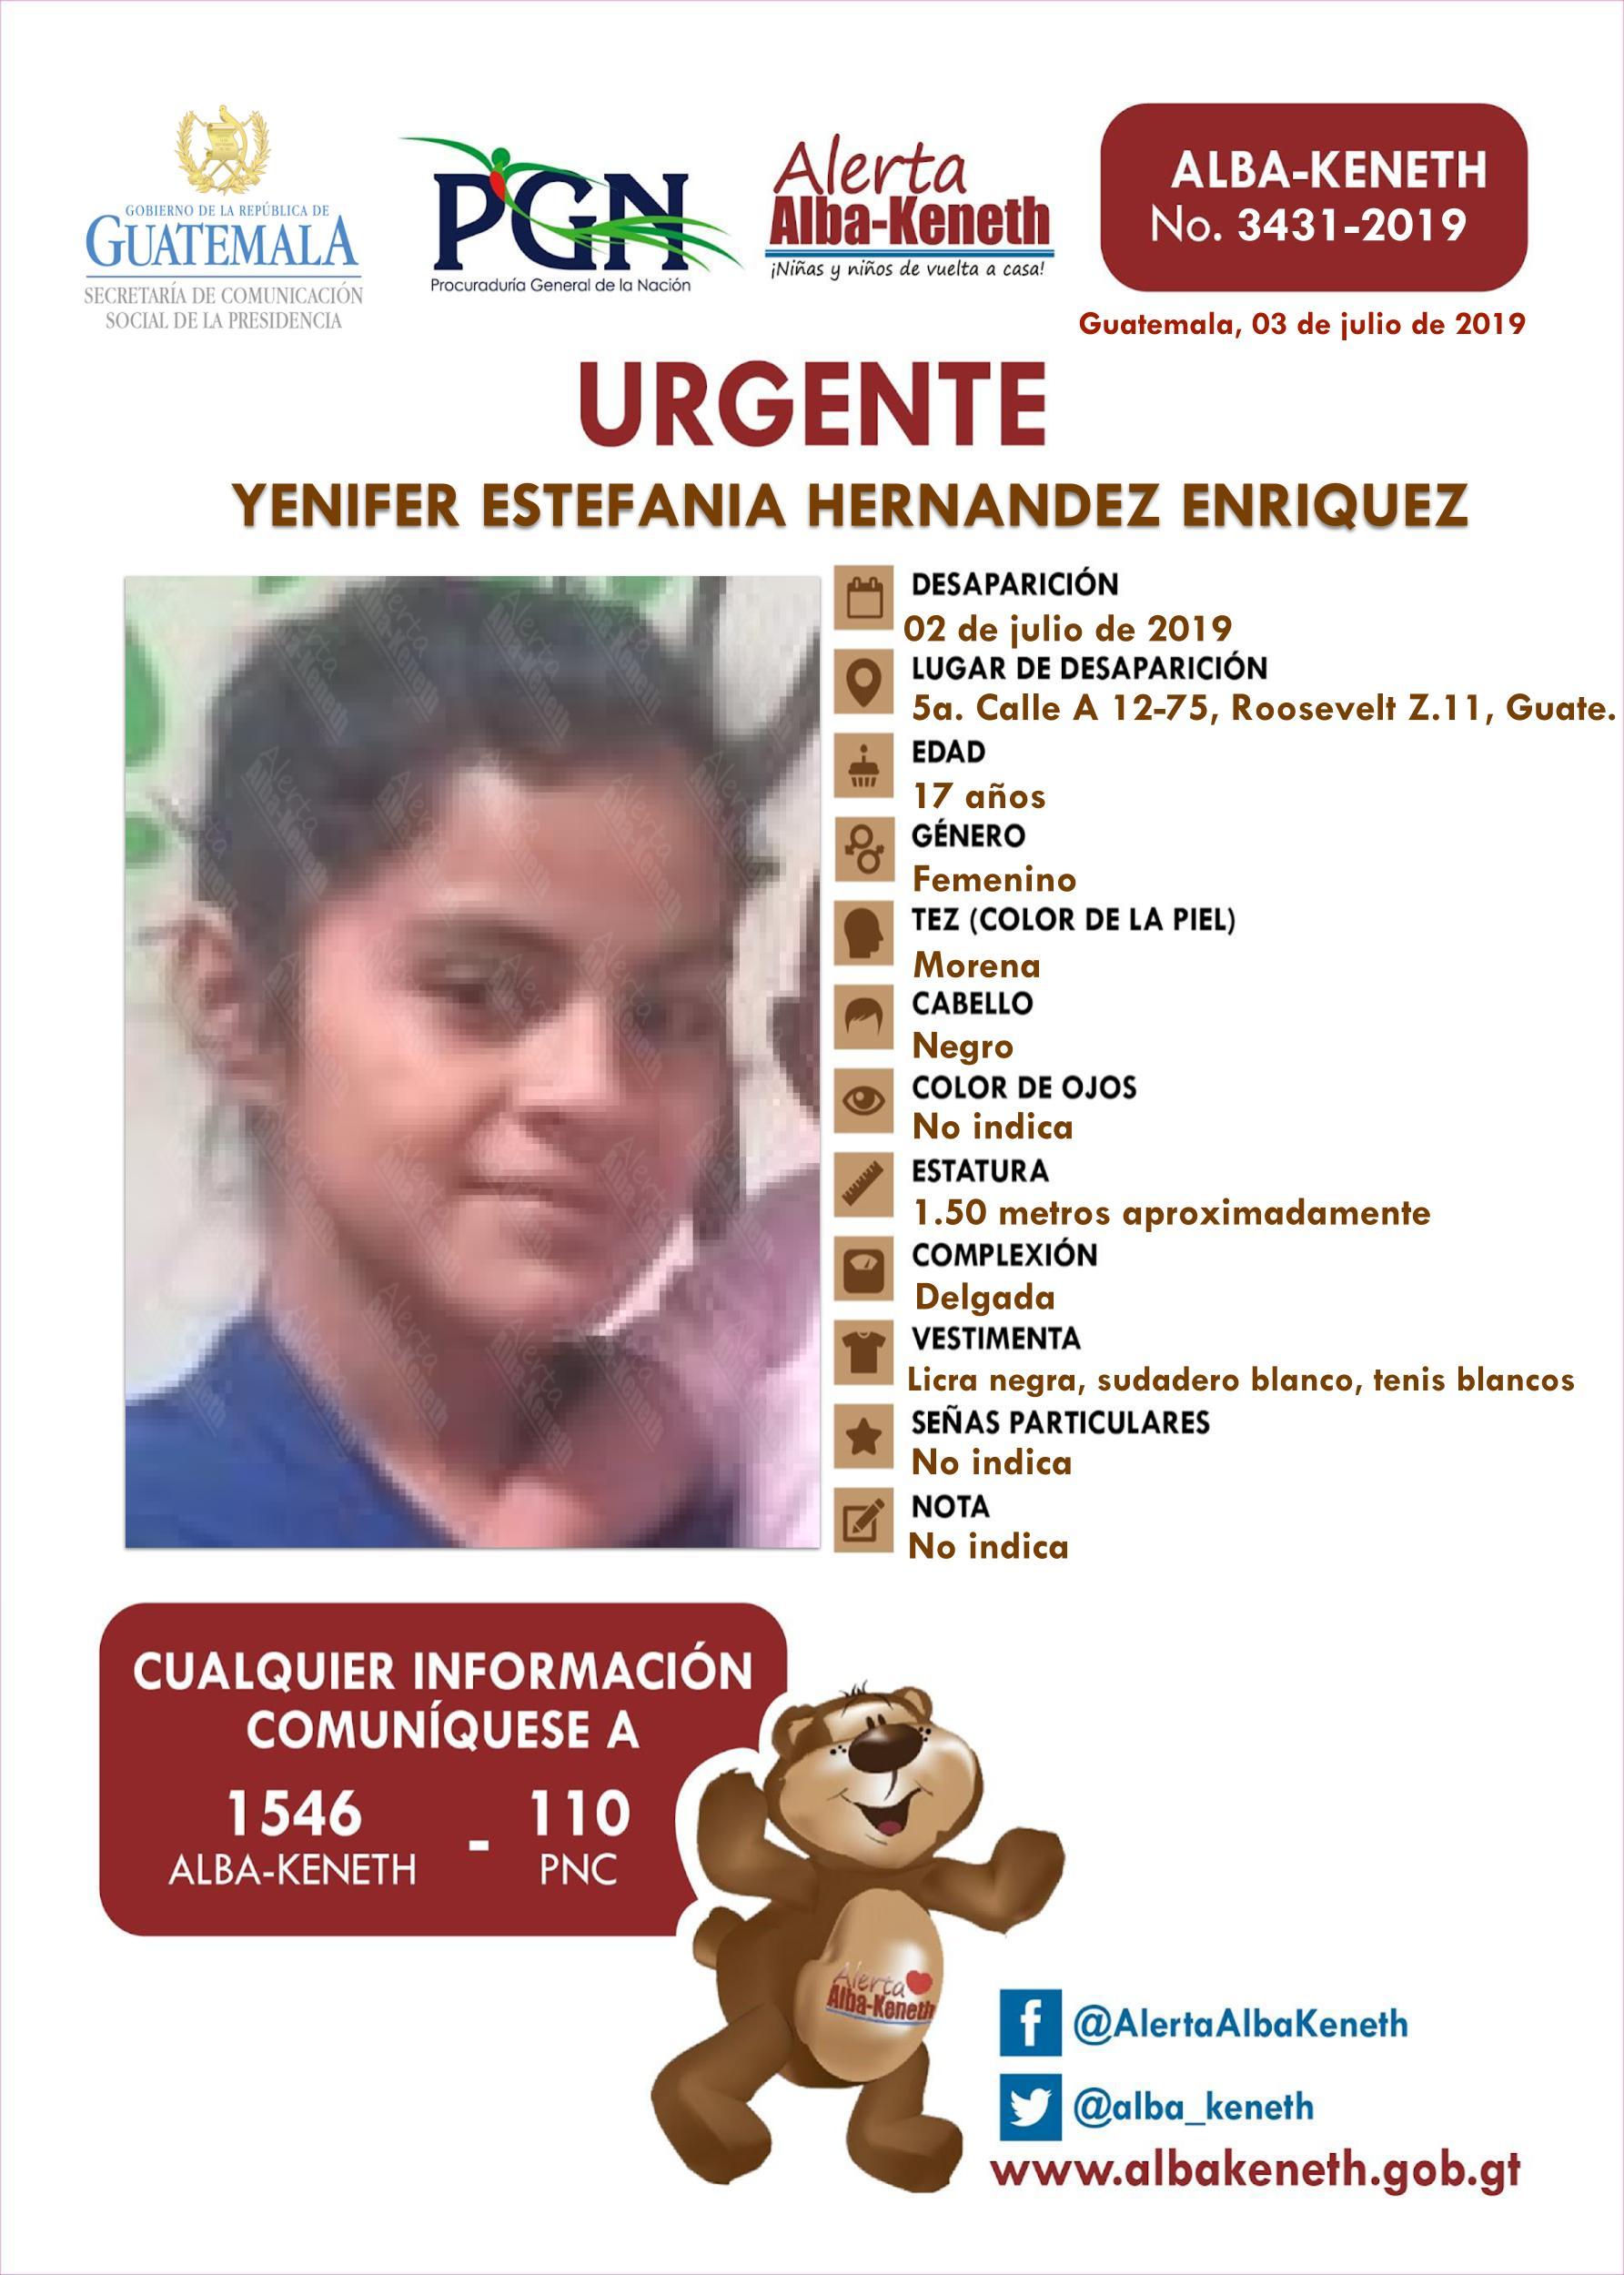 Yenifer Estefania Hernandez Enriquez